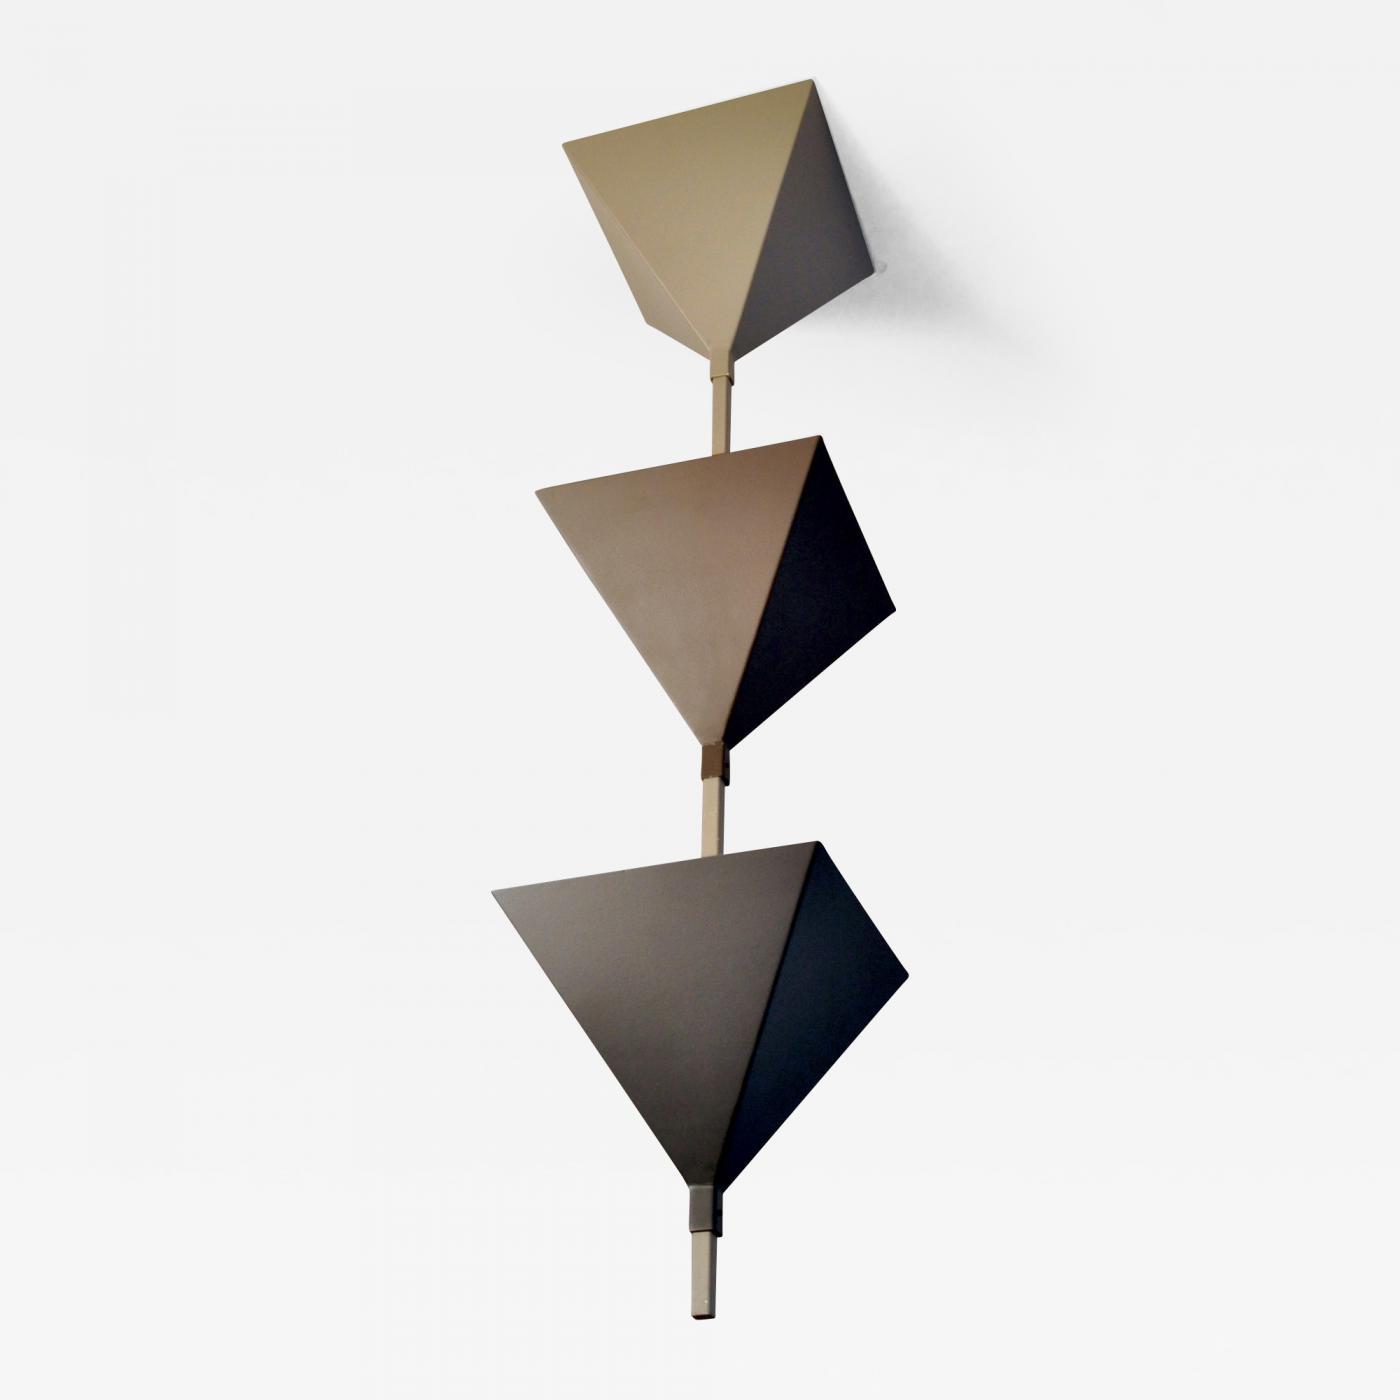 Cubistic Ceiling Lamp, Zurich 1980s Image